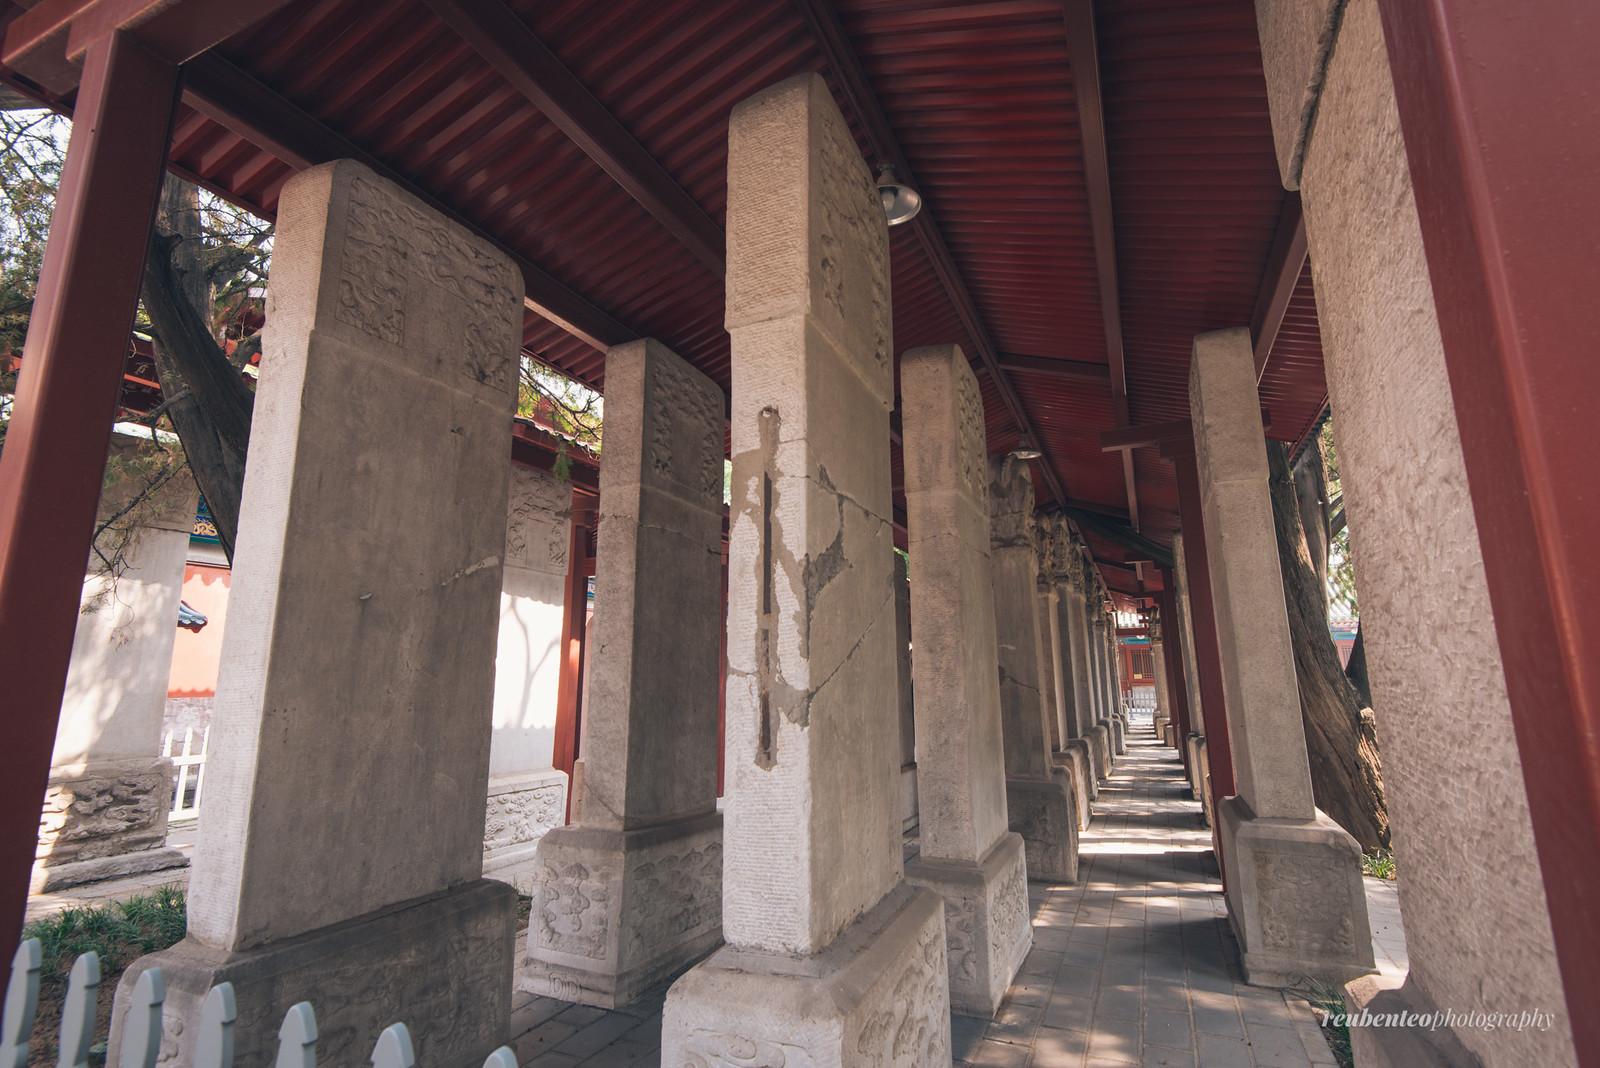 Stone Stele Pavilions of Confucius Temple Beijing